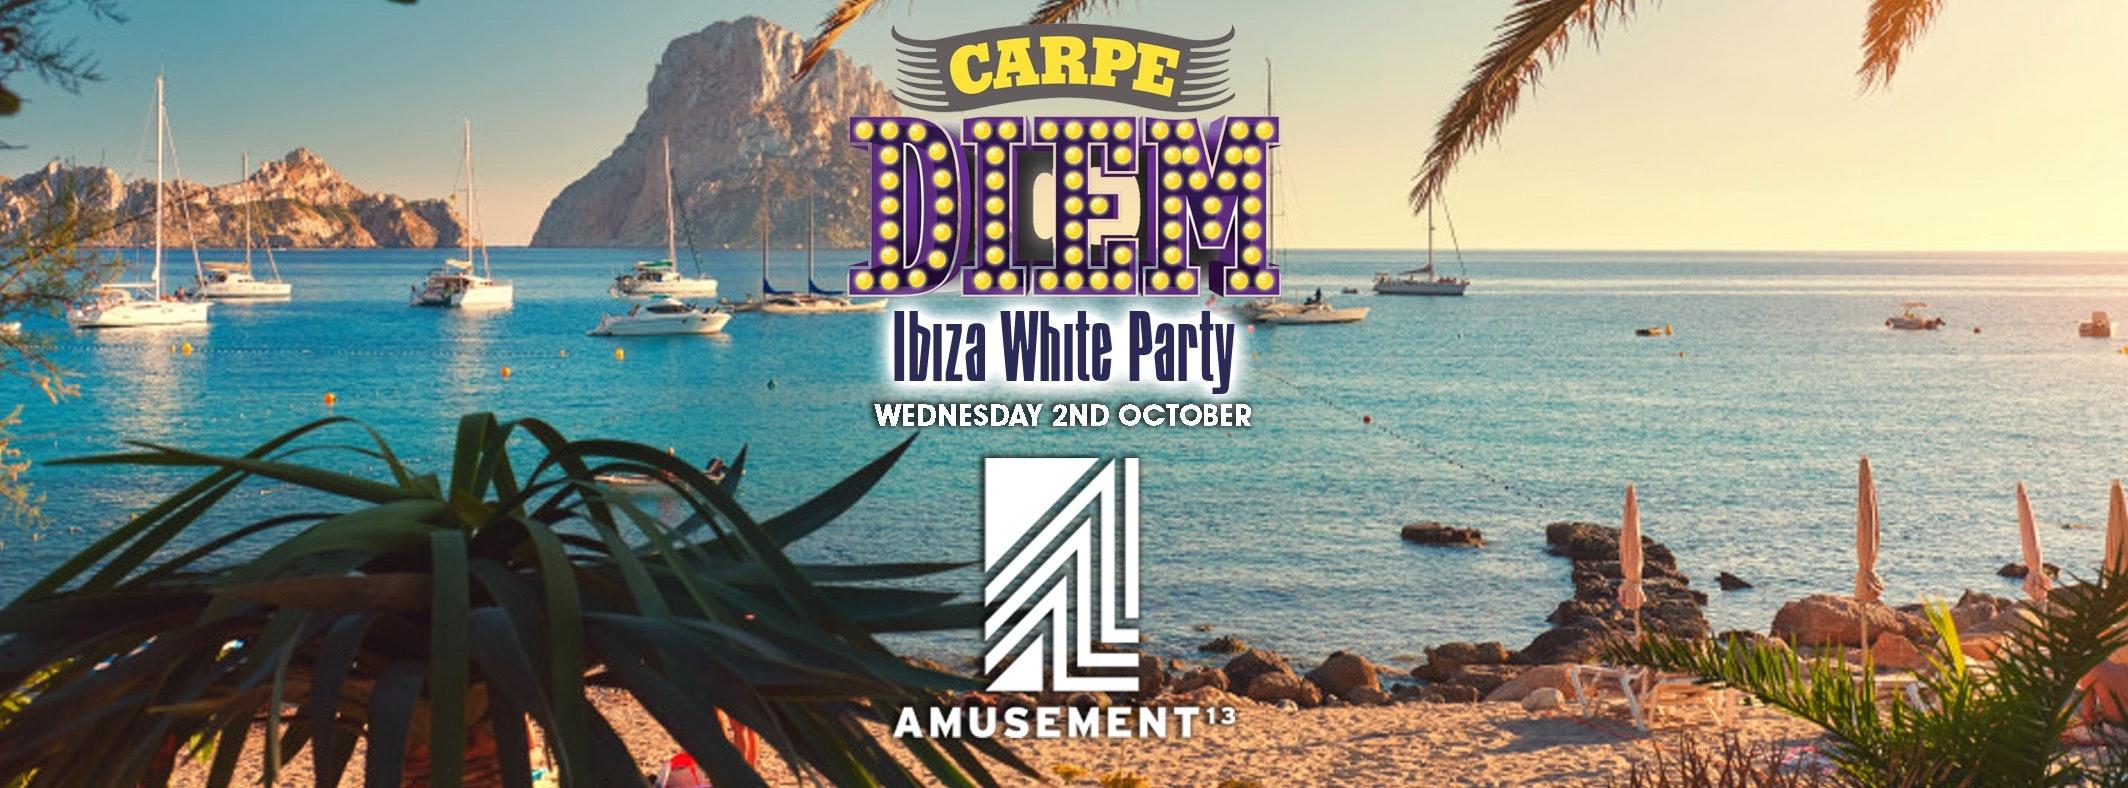 Carpe Diem – Ibiza White Party – Amusement 13